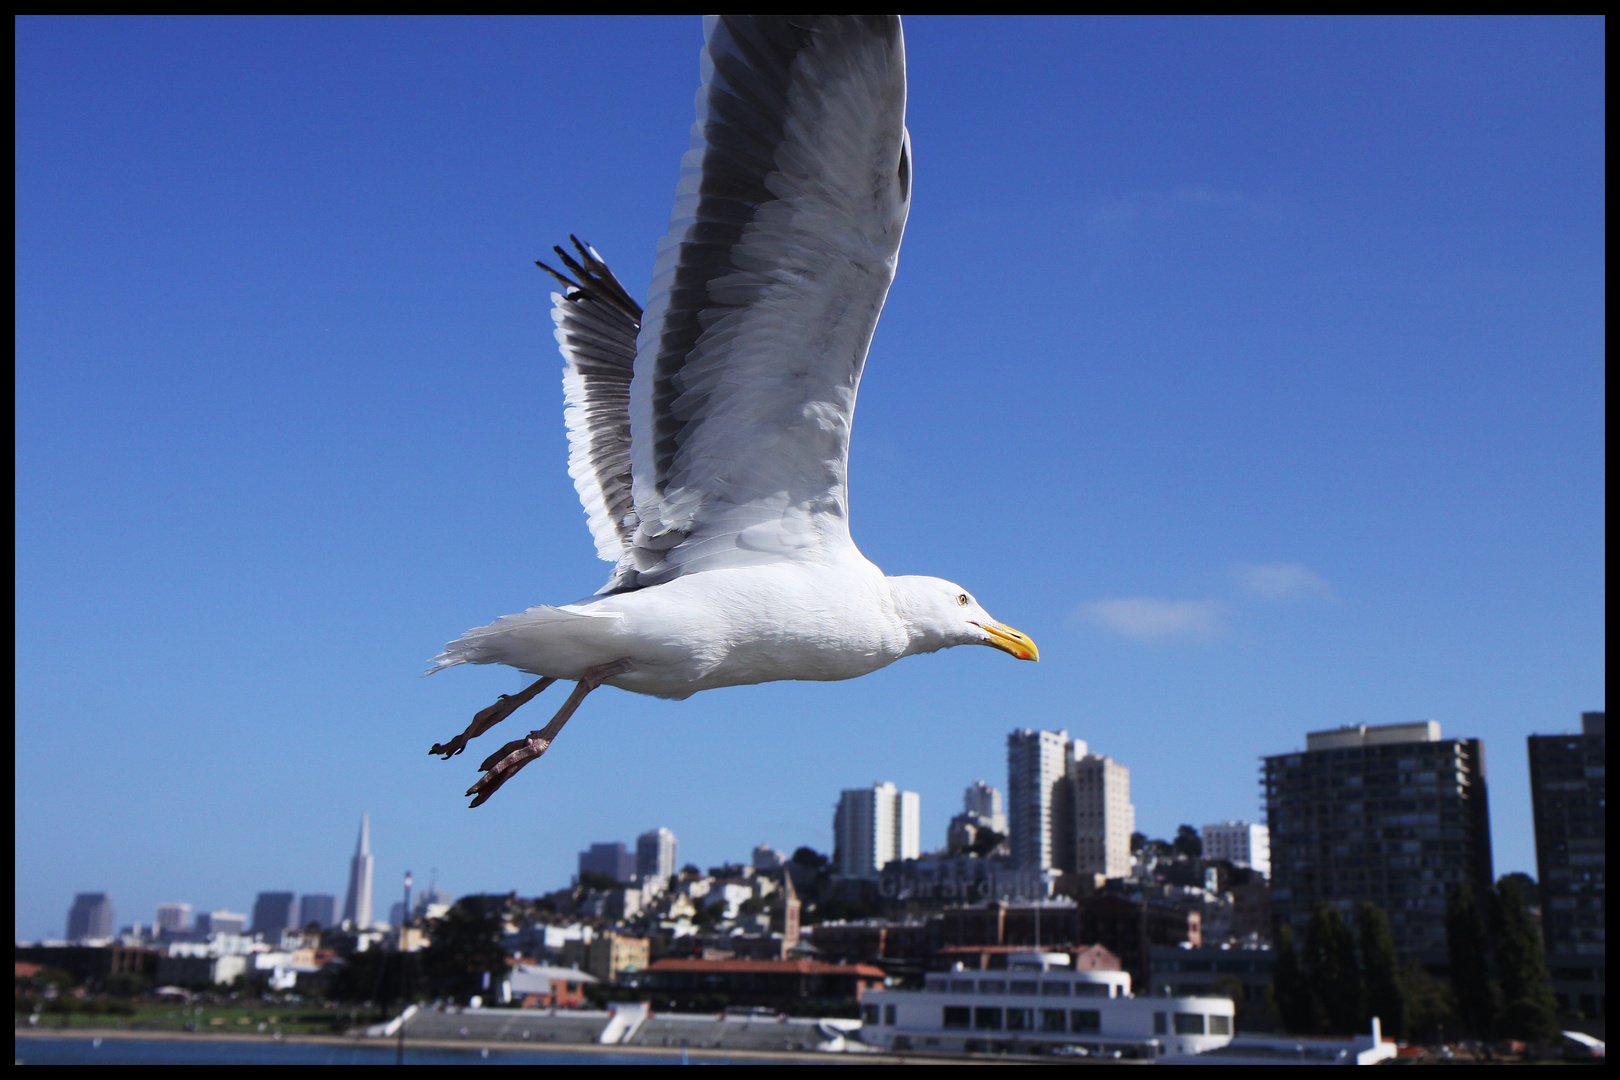 Flying to San Fransisco